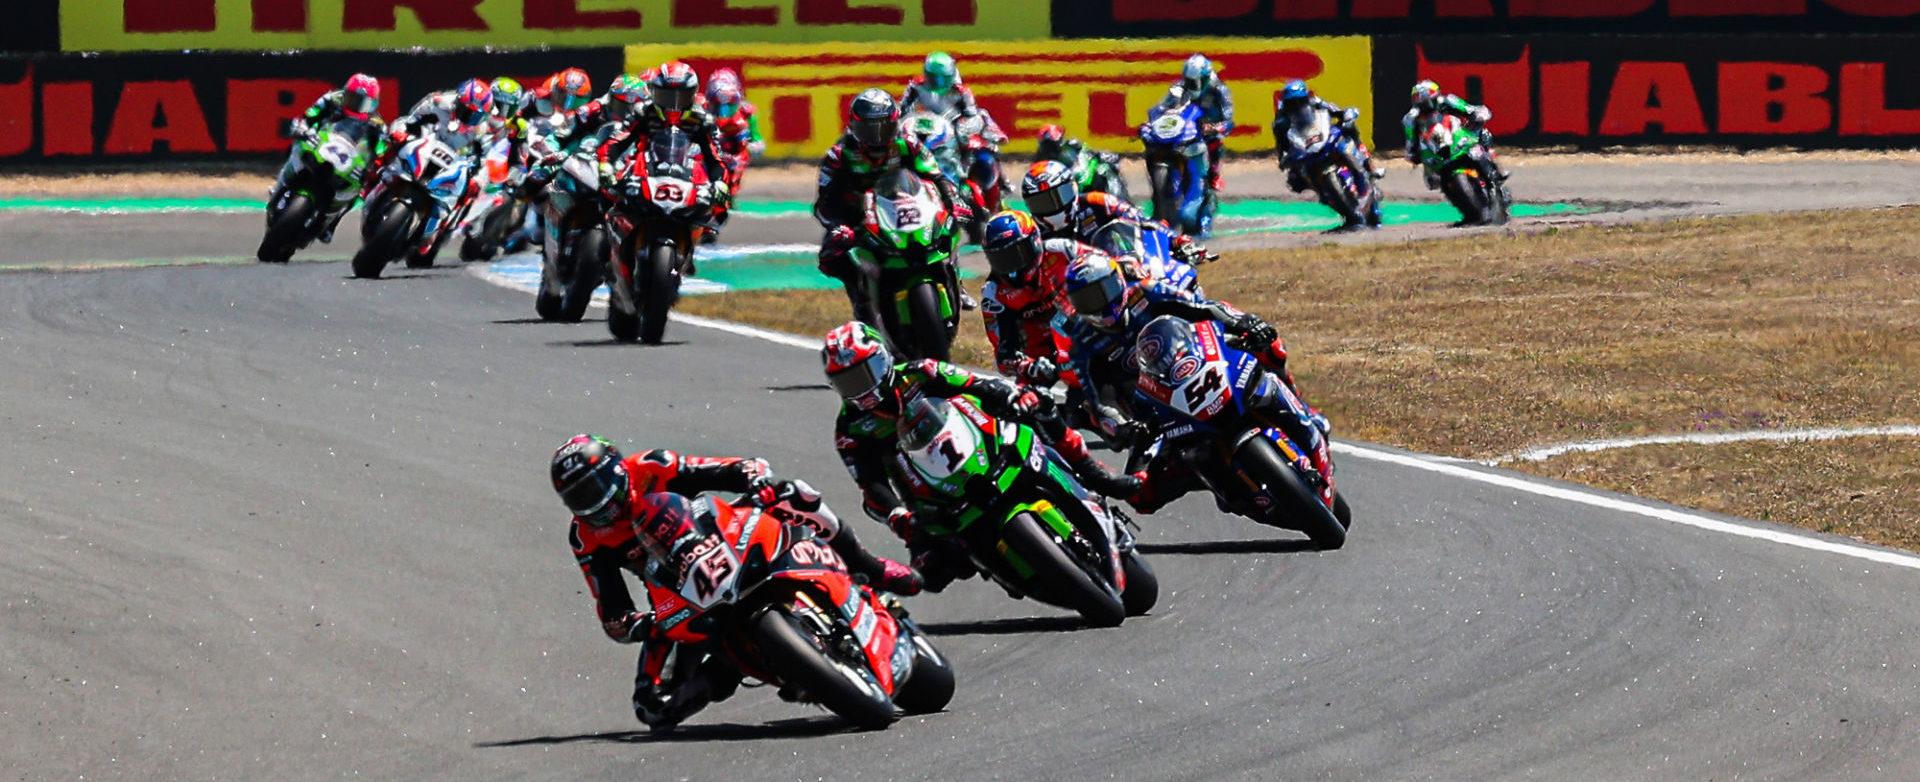 The FIM Superbike World Championship is heading to Misano World Circuit Marco Simoncelli next weekend. Photo courtesy Dorna.